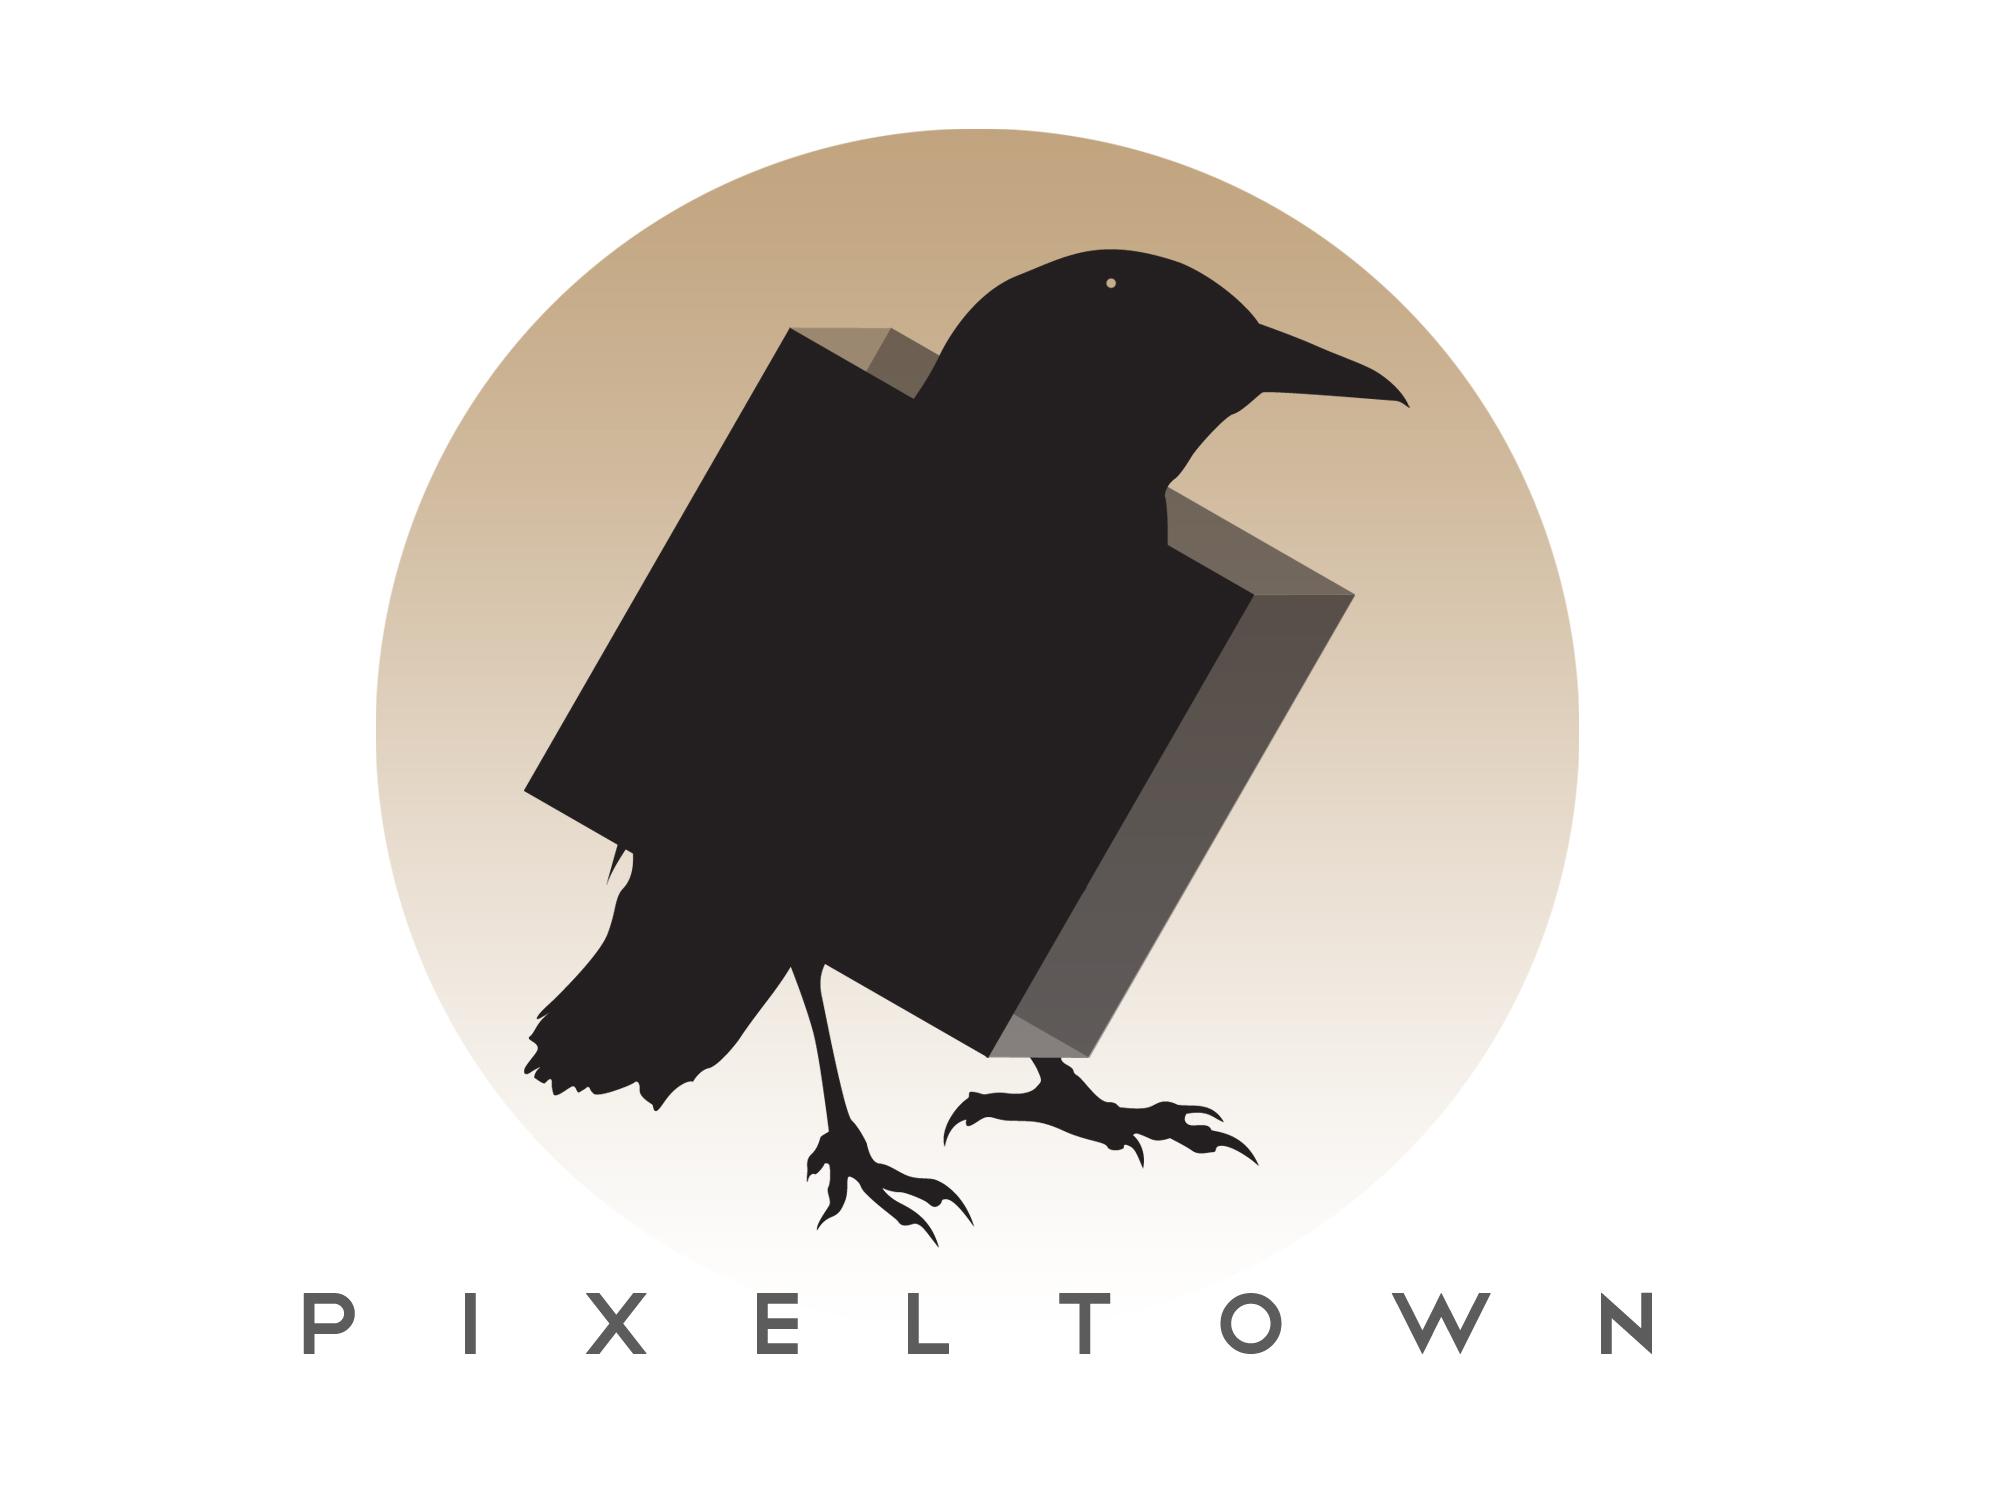 Pixeltown Arts